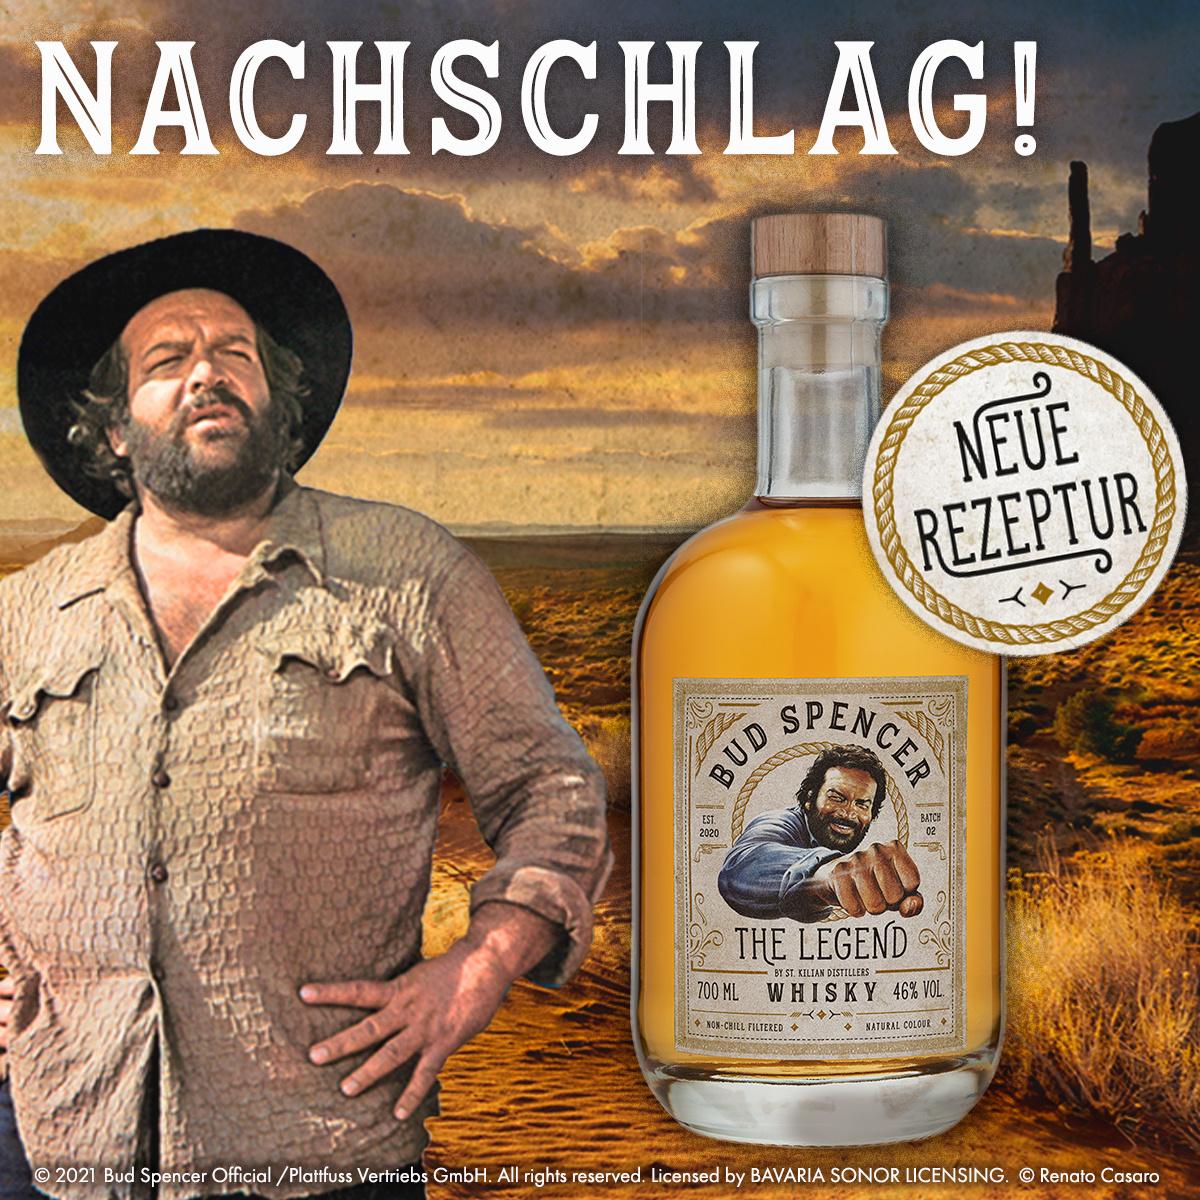 Bud Spencer Whisky mit neuer Rezeptur